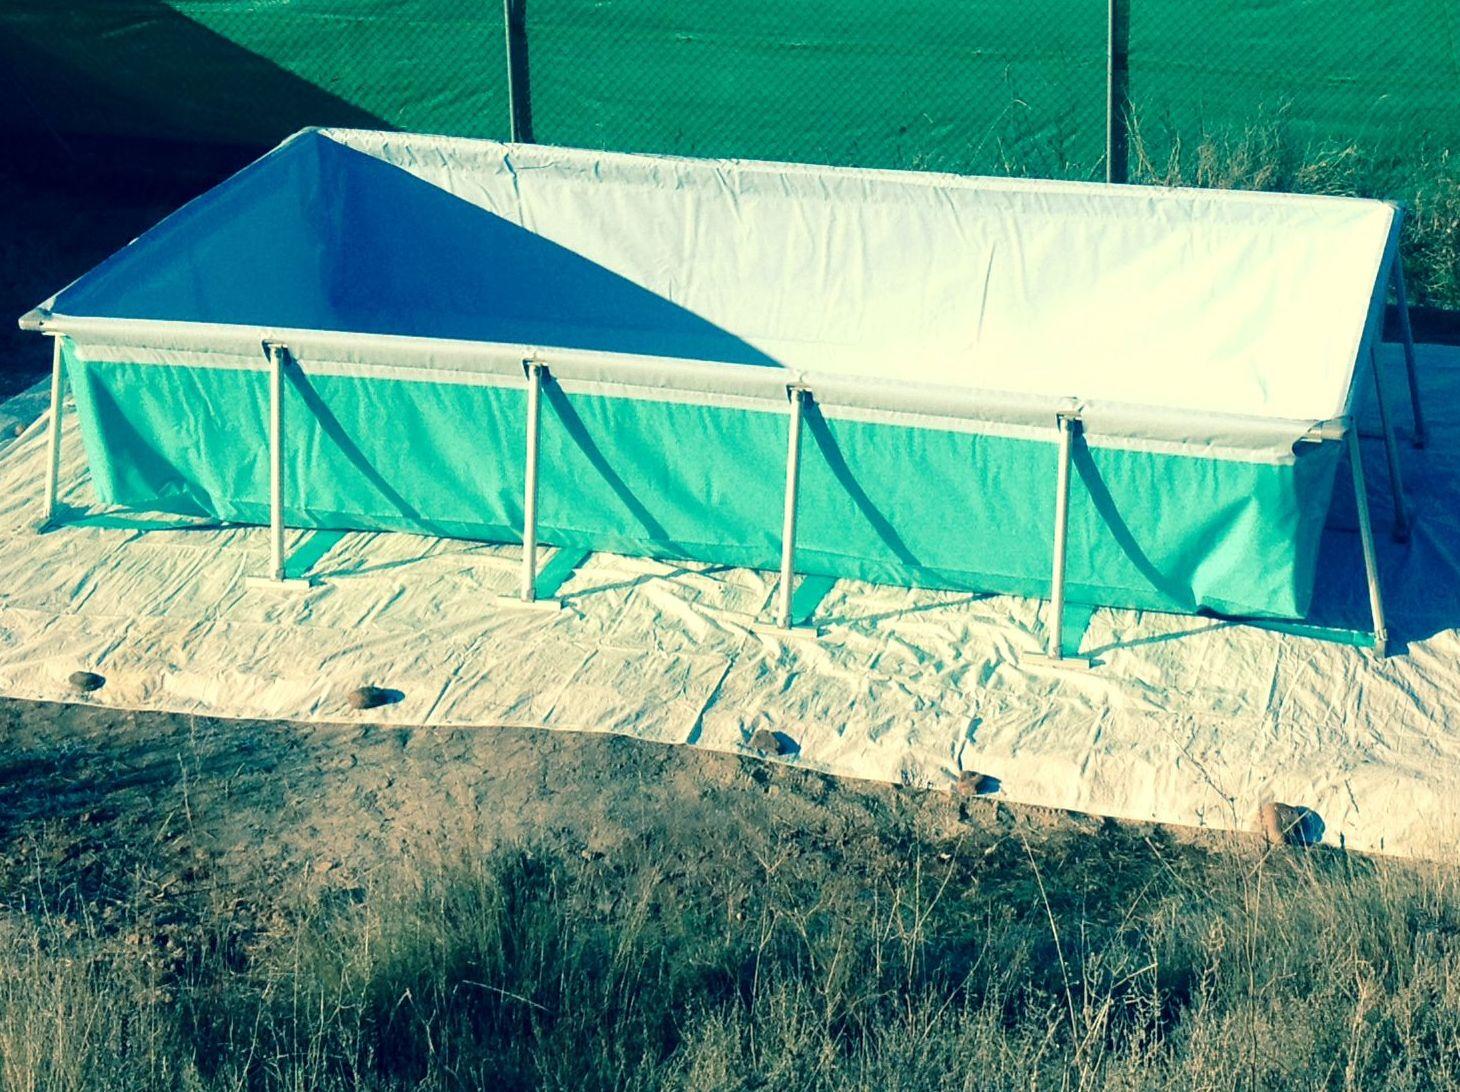 Instalación de piscinas Logroño